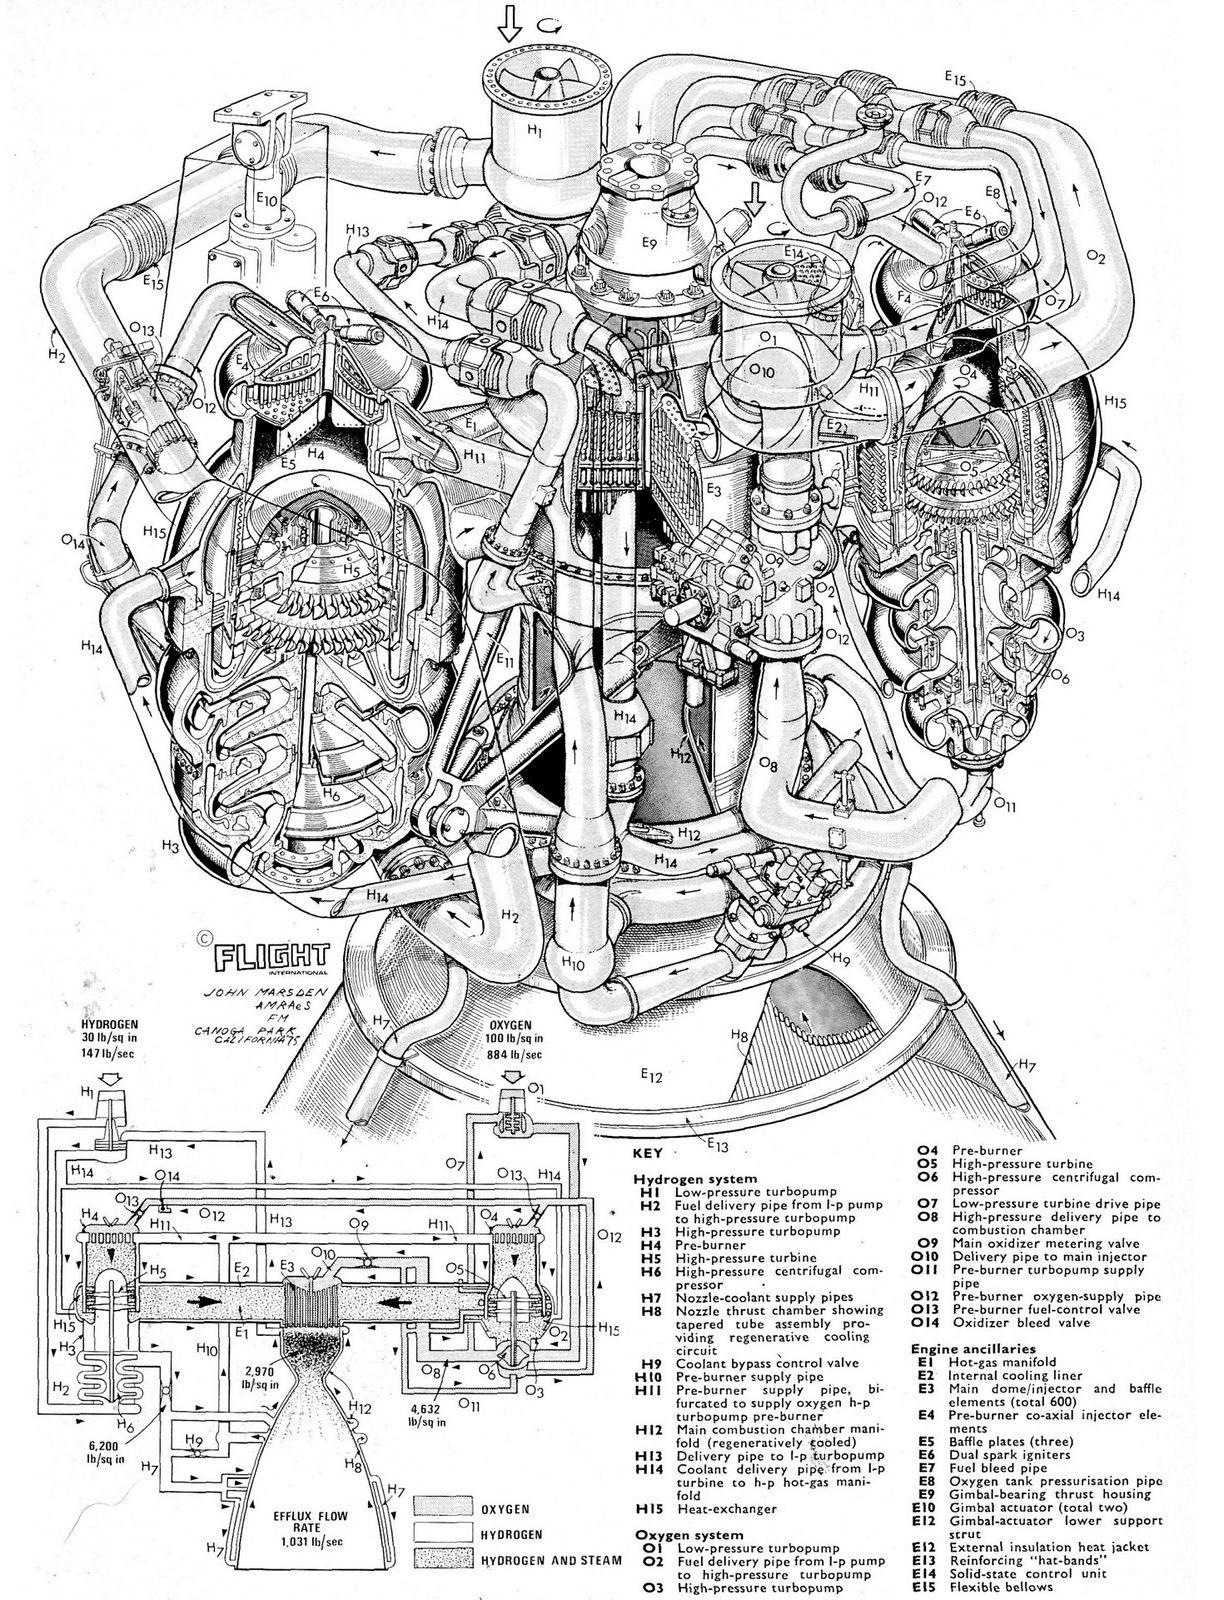 space shuttle main engine mechanisms space, space shuttle Aircraft Engine Diagram space shuttle main engine